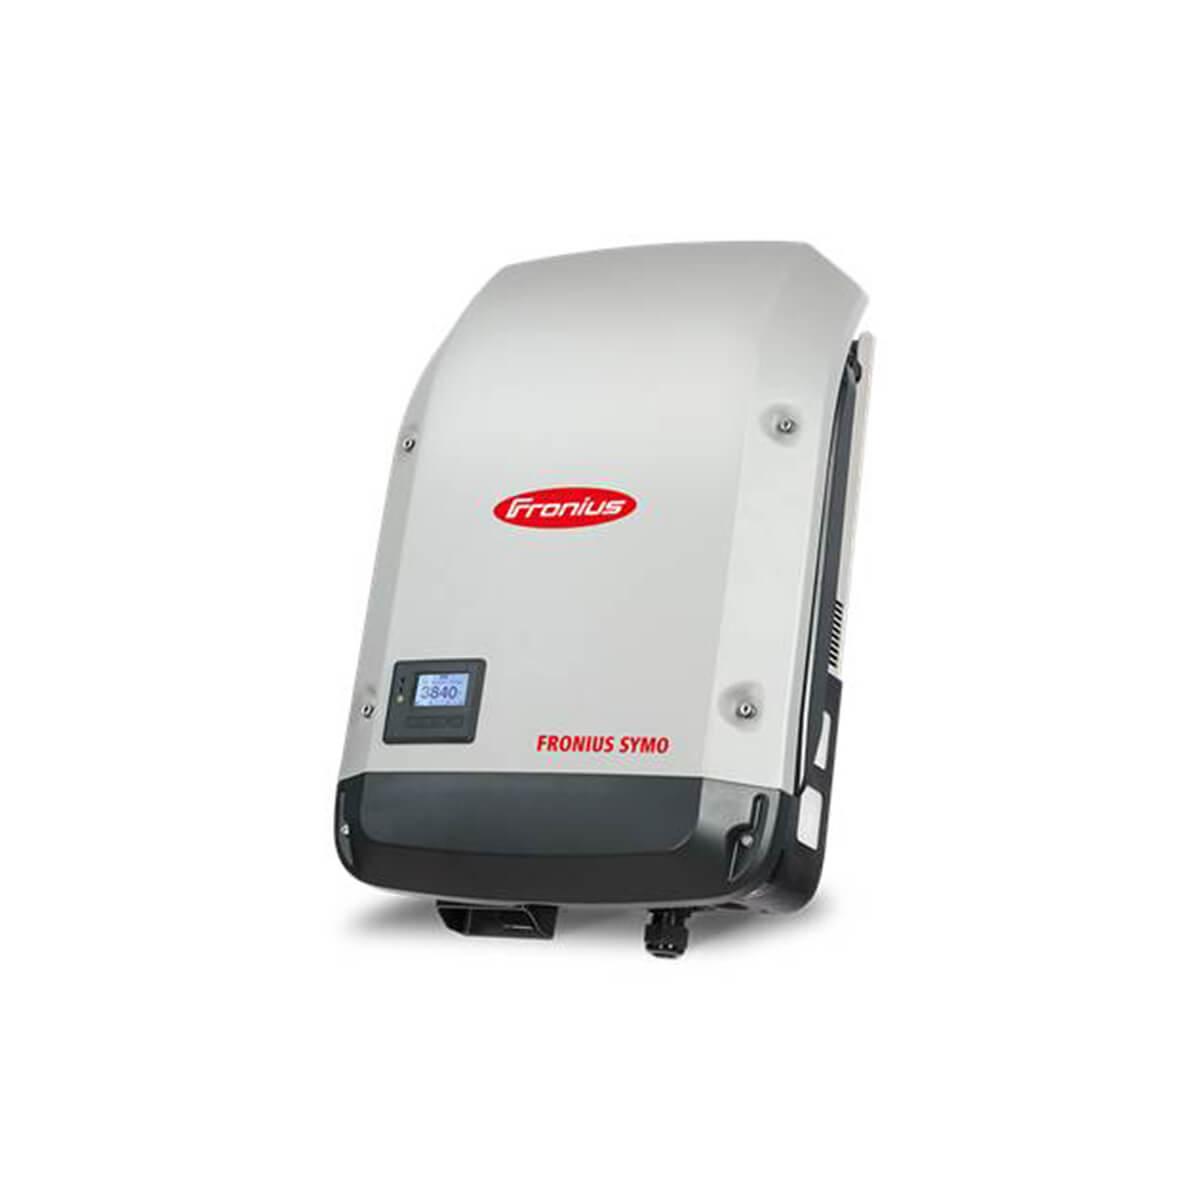 fronius 5kW inverter, fronius symo 5kW inverter, fronius symo 5.0-3-m inverter, fronius symo 5.0-3-m, fronius symo 5 kW